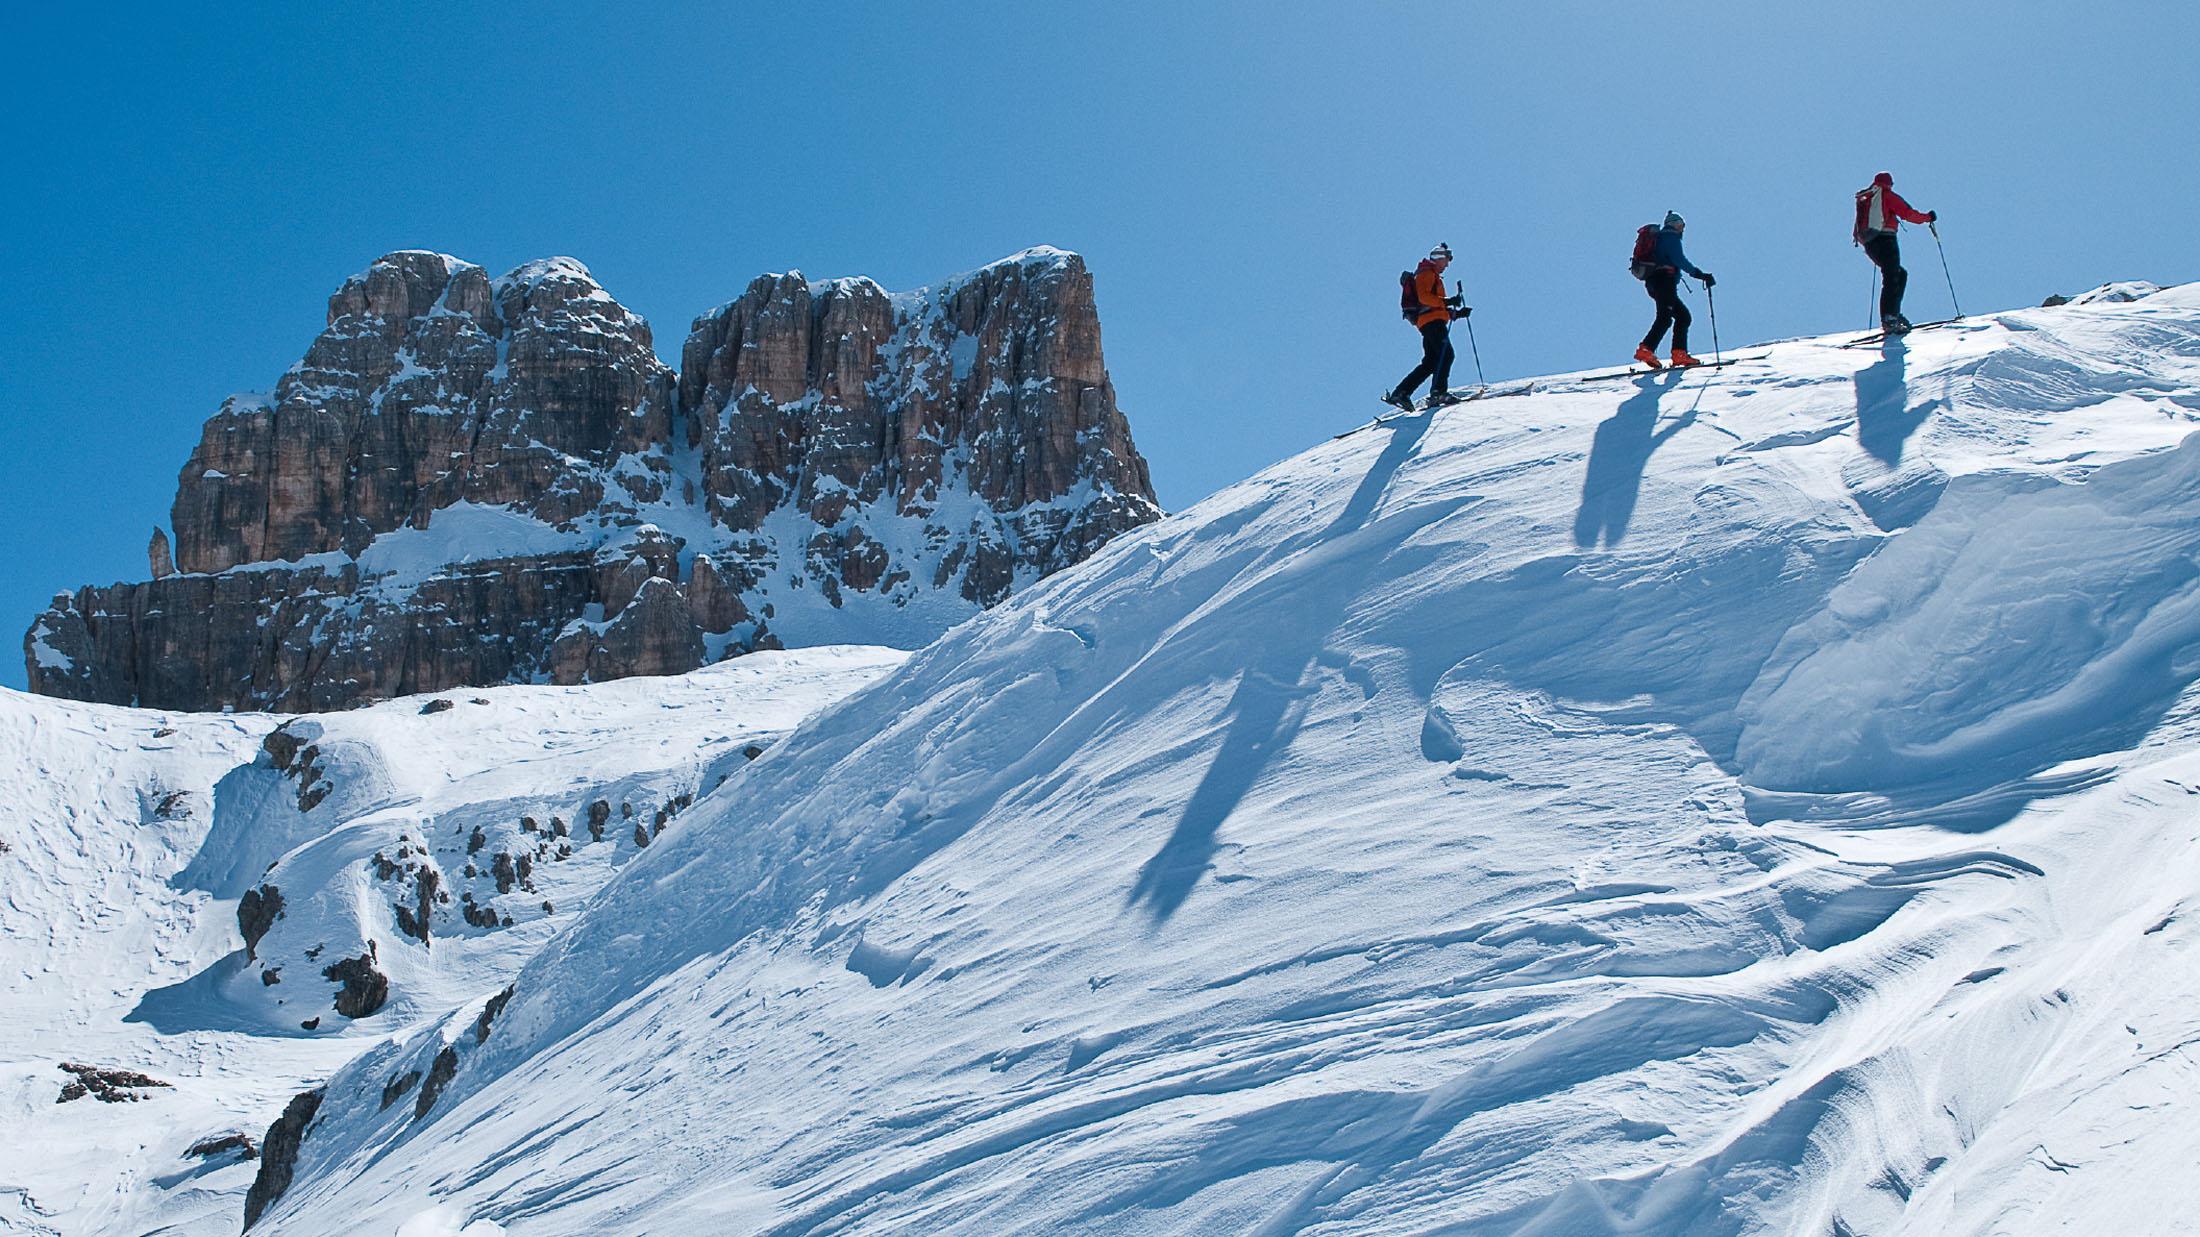 Cortina d'Ampezzo im Winter 2011/12